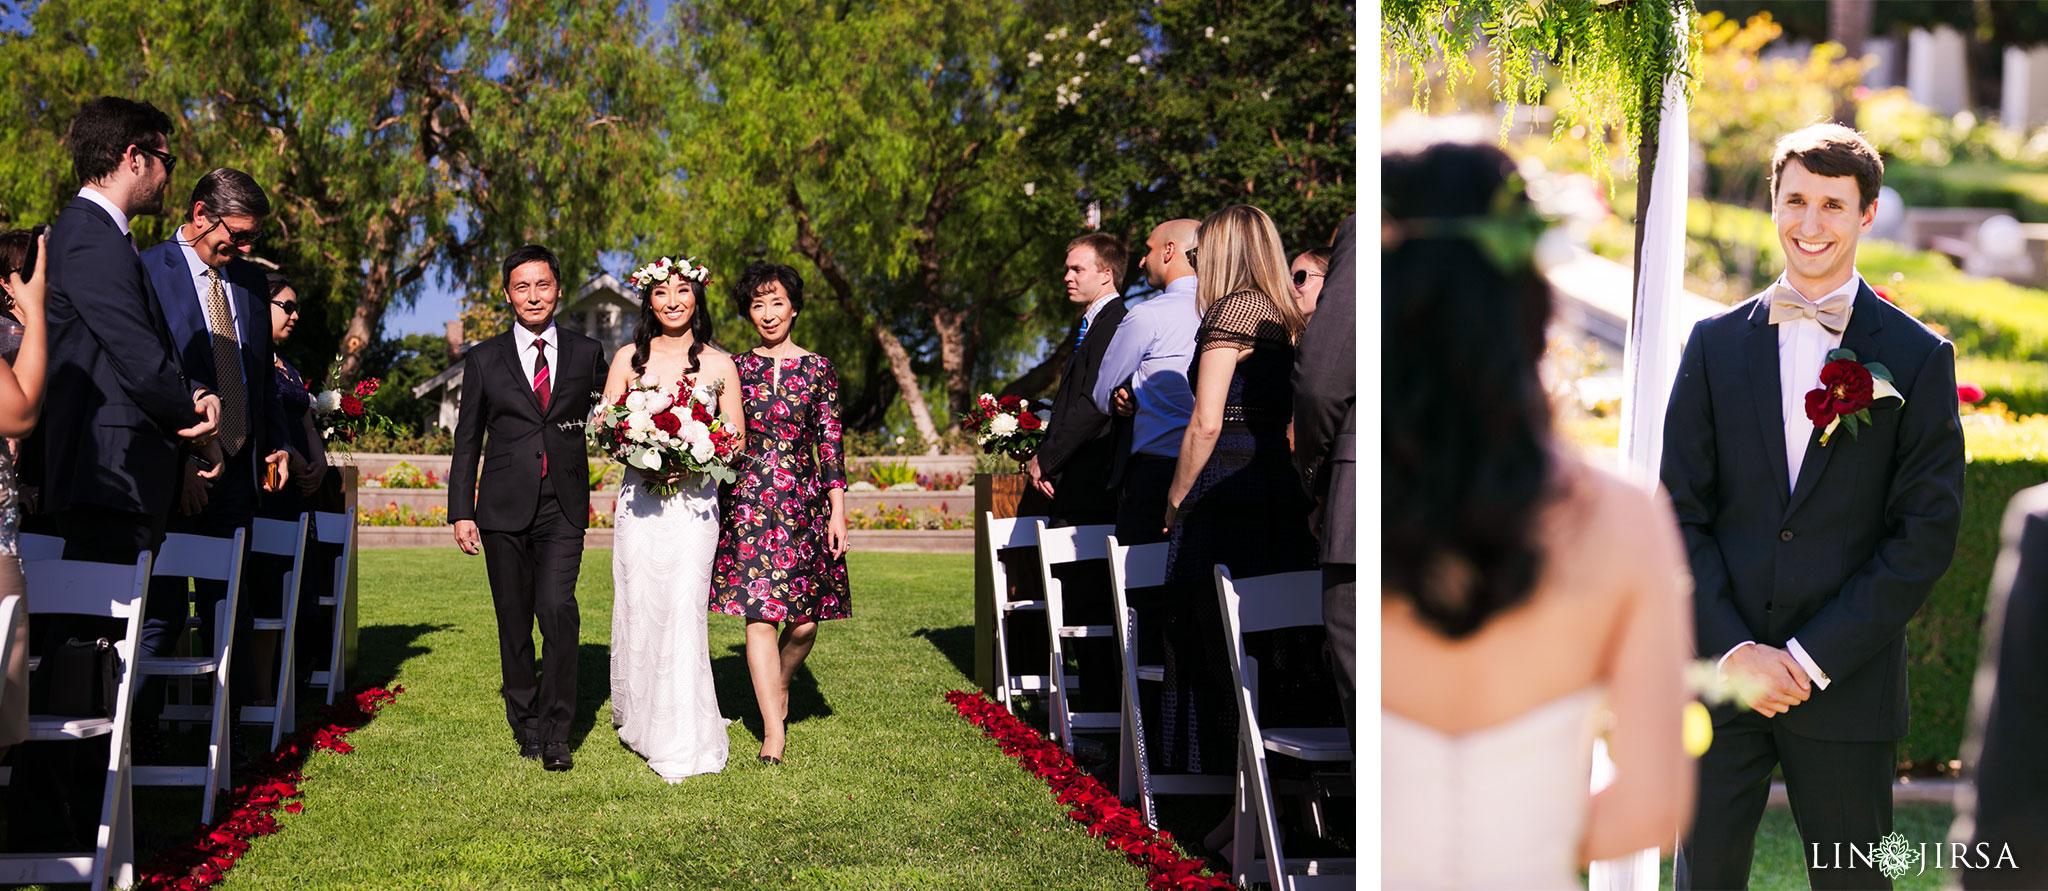 019 richard nixon library wedding ceremony photography 1